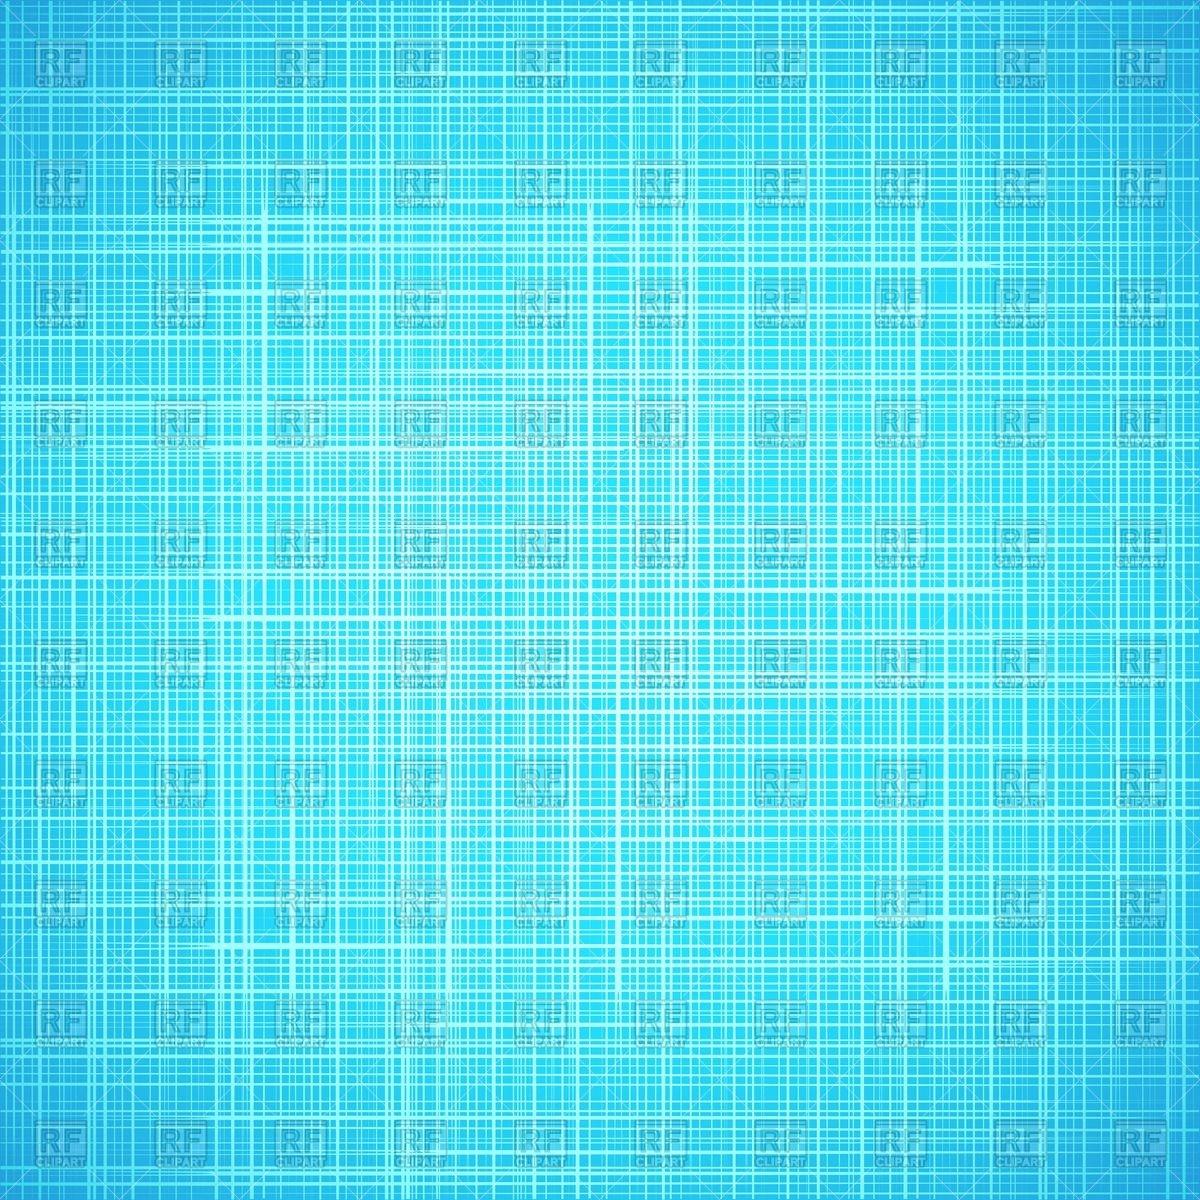 Clip art textures backgrounds.